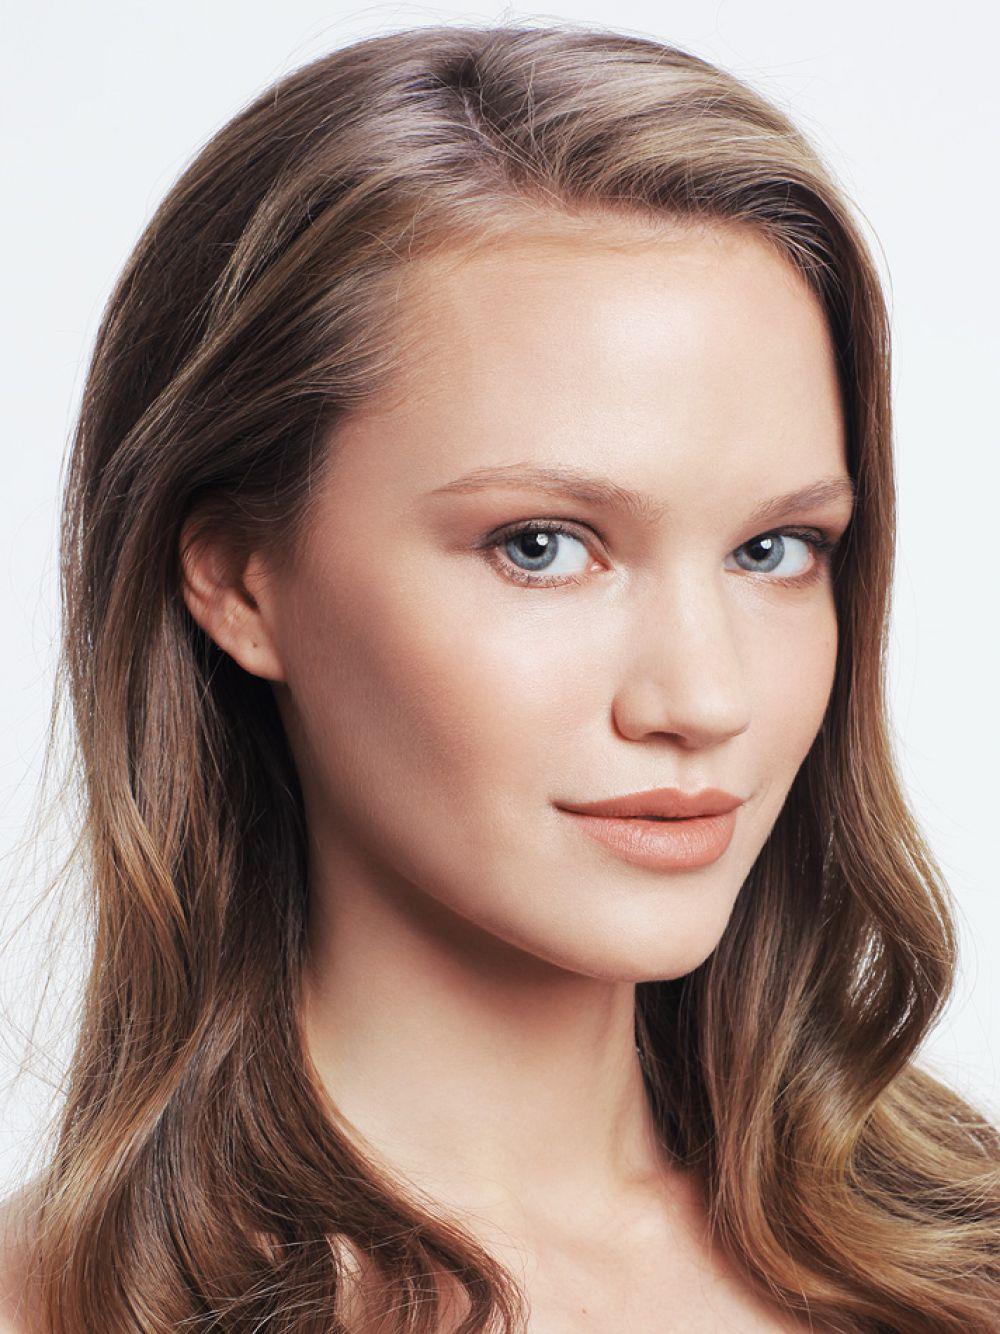 Анна Корниенко, 20 лет, 174 см.